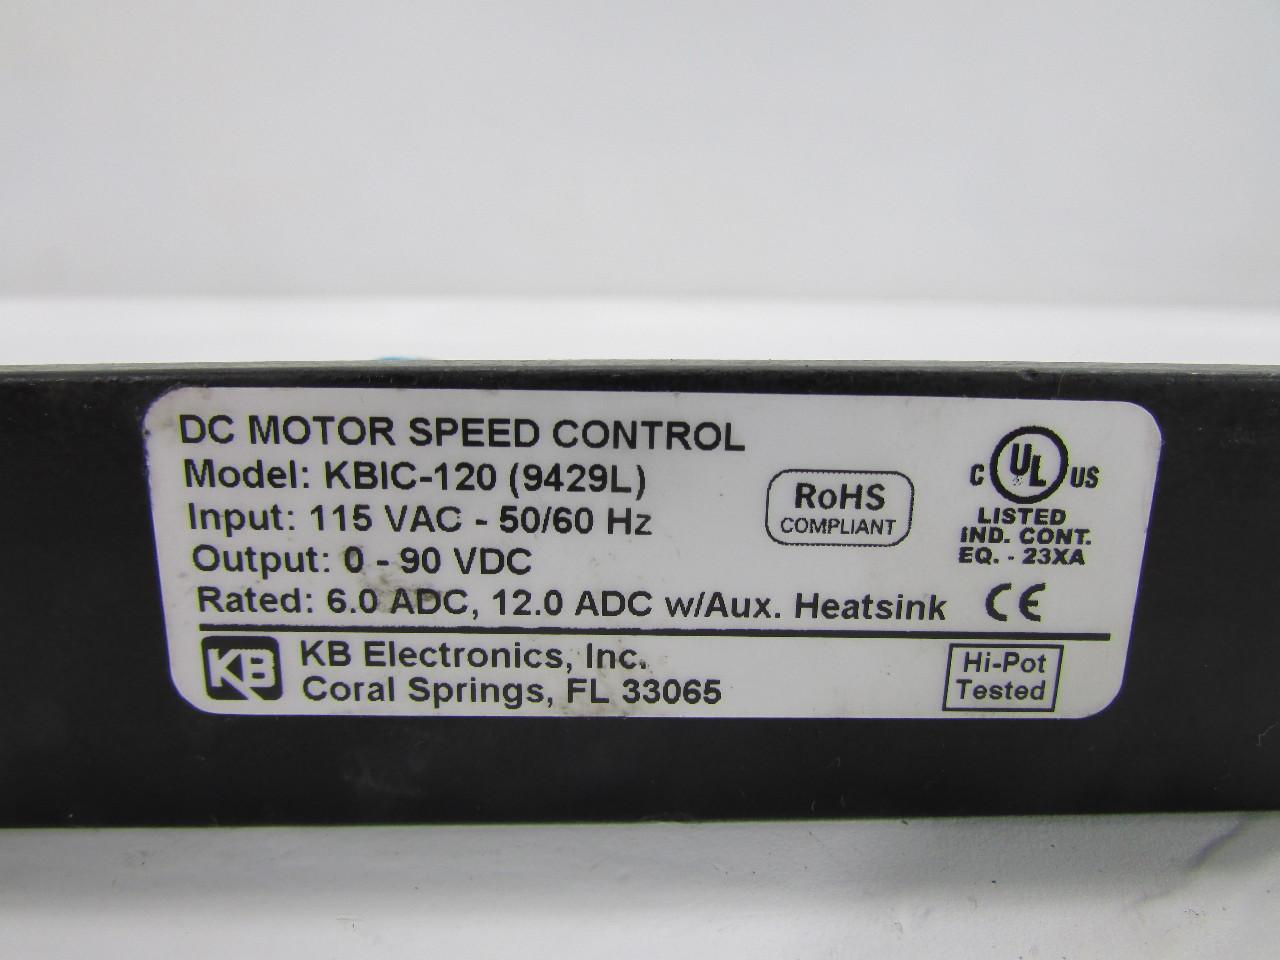 KB KBIC-120 (9429L) DC MOTOR SPEED CONTROL | eBay